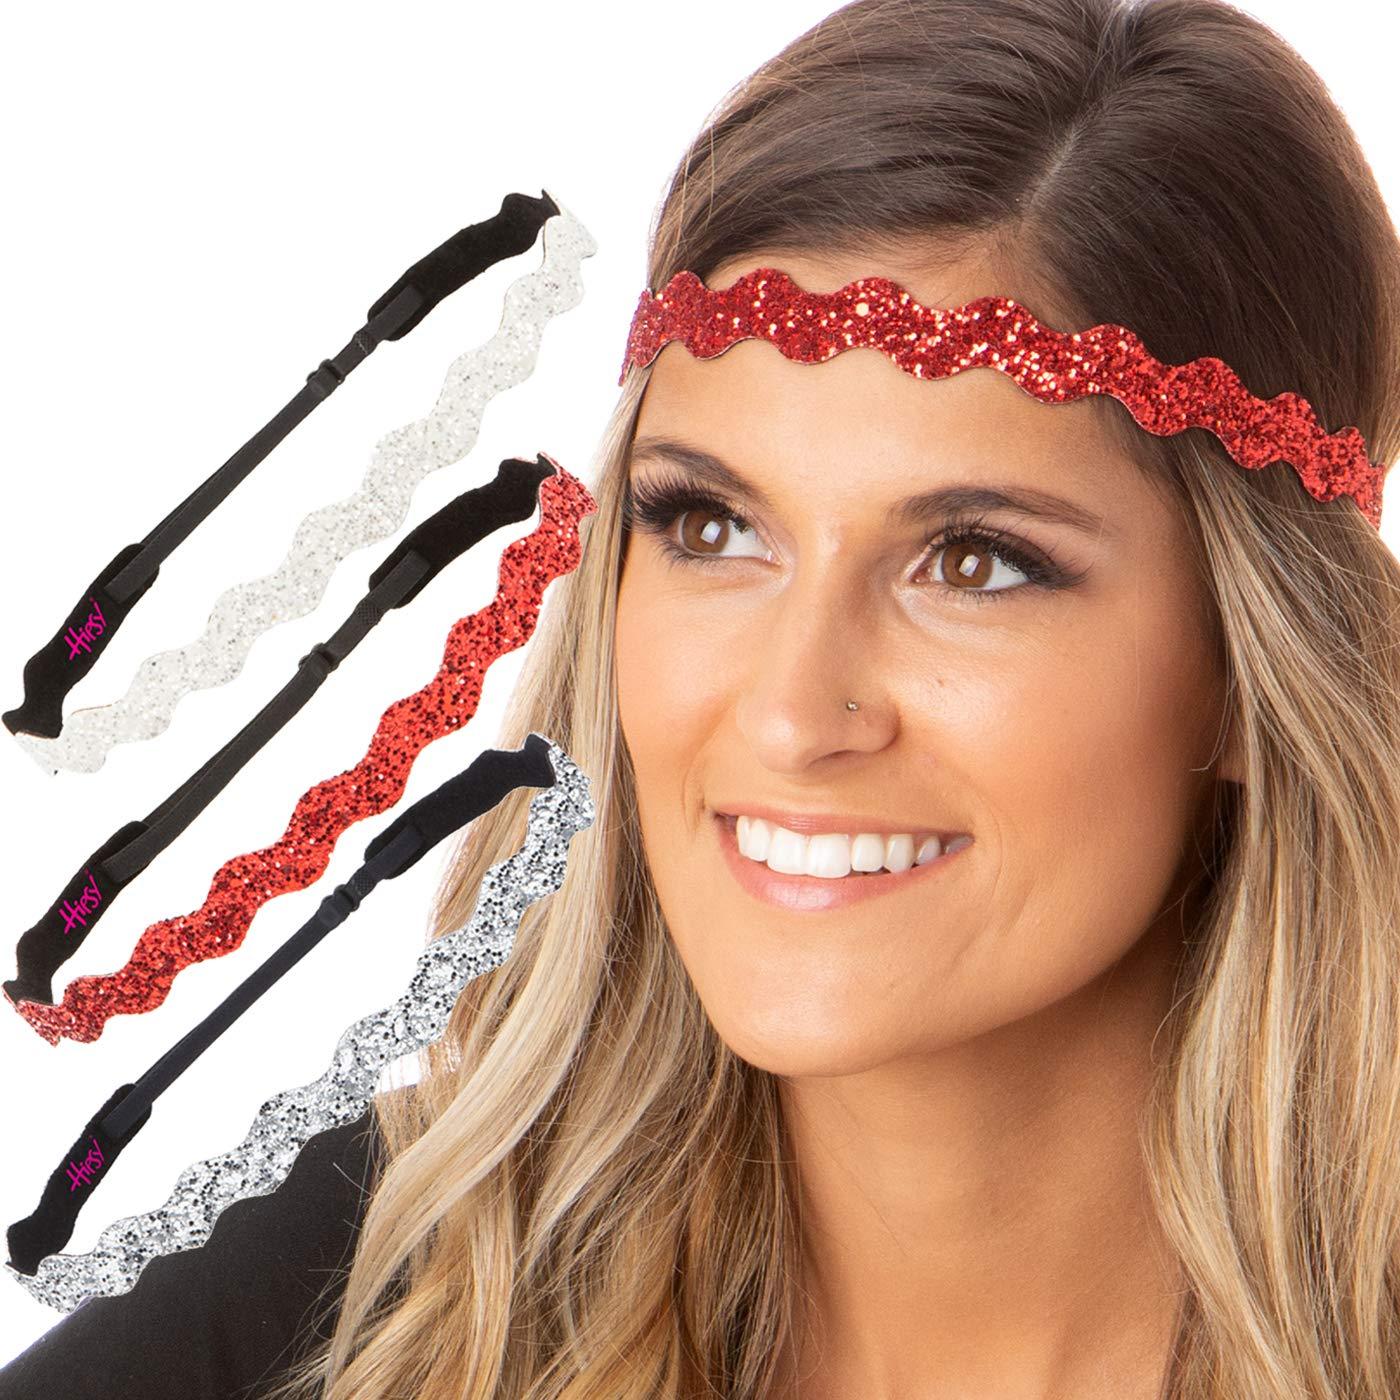 Hipsy Women's Adjustable No Slip Cute Fashion Hearts & Bling Glitter Valentine's Day Hair Headband Multi Packs (Valentine's Silver/Red/White Wave Bling Glitter 3pk)